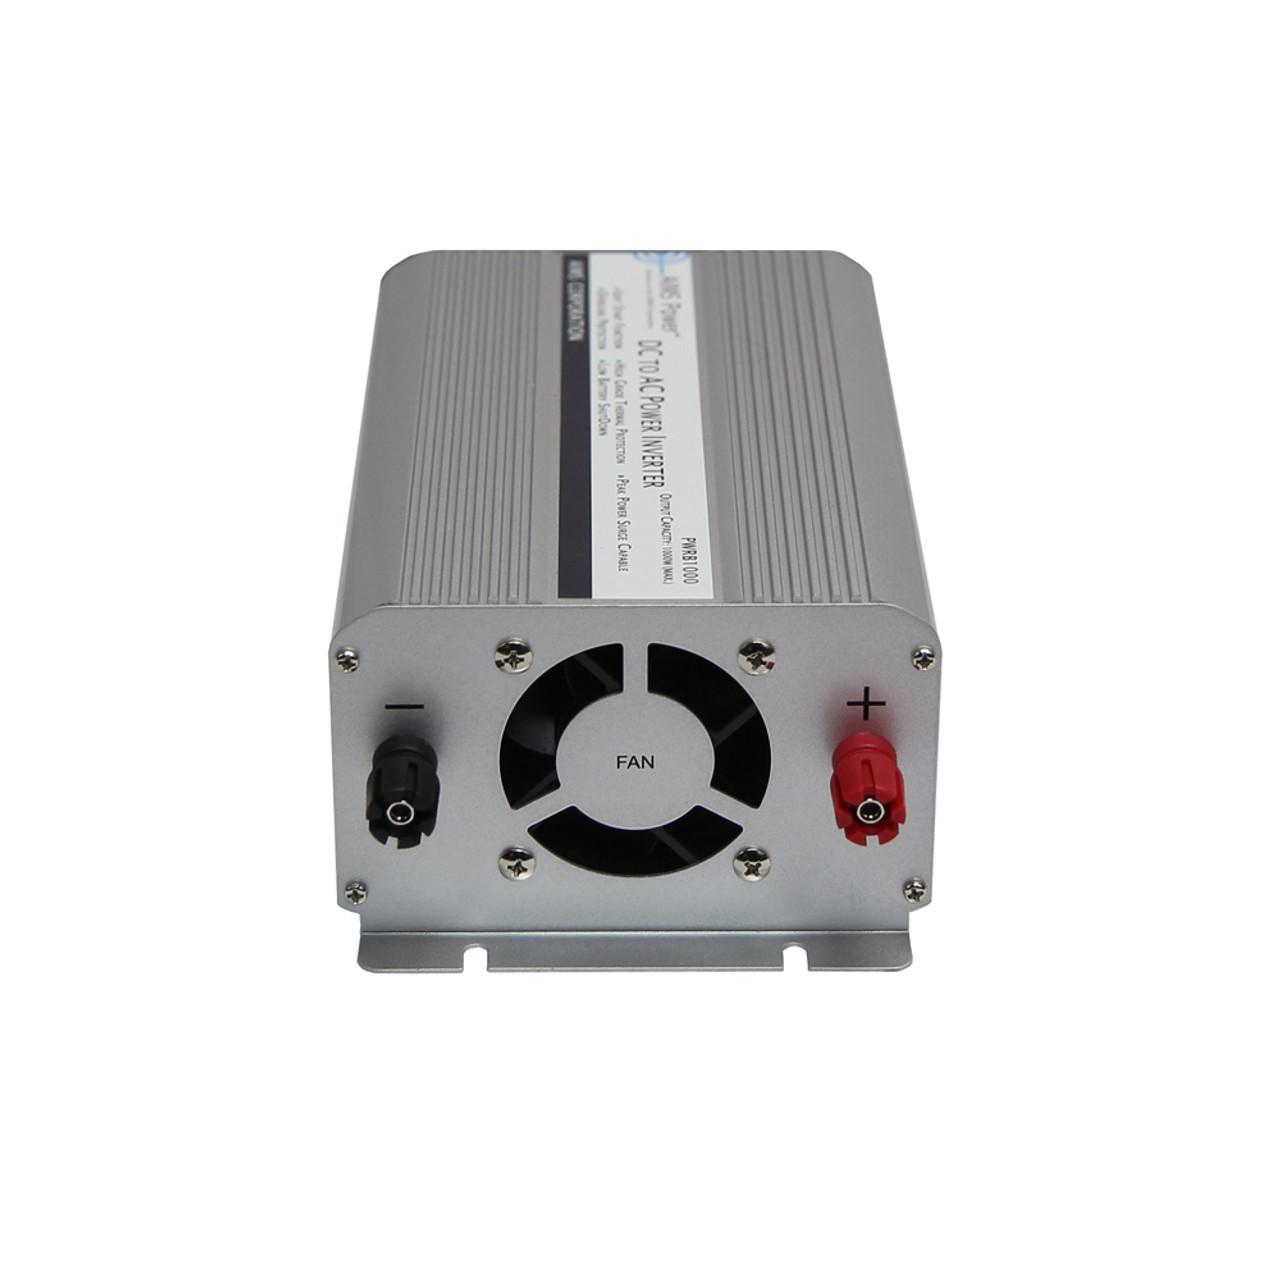 AIMS 1000 Watt Power Inverter 12 Volt